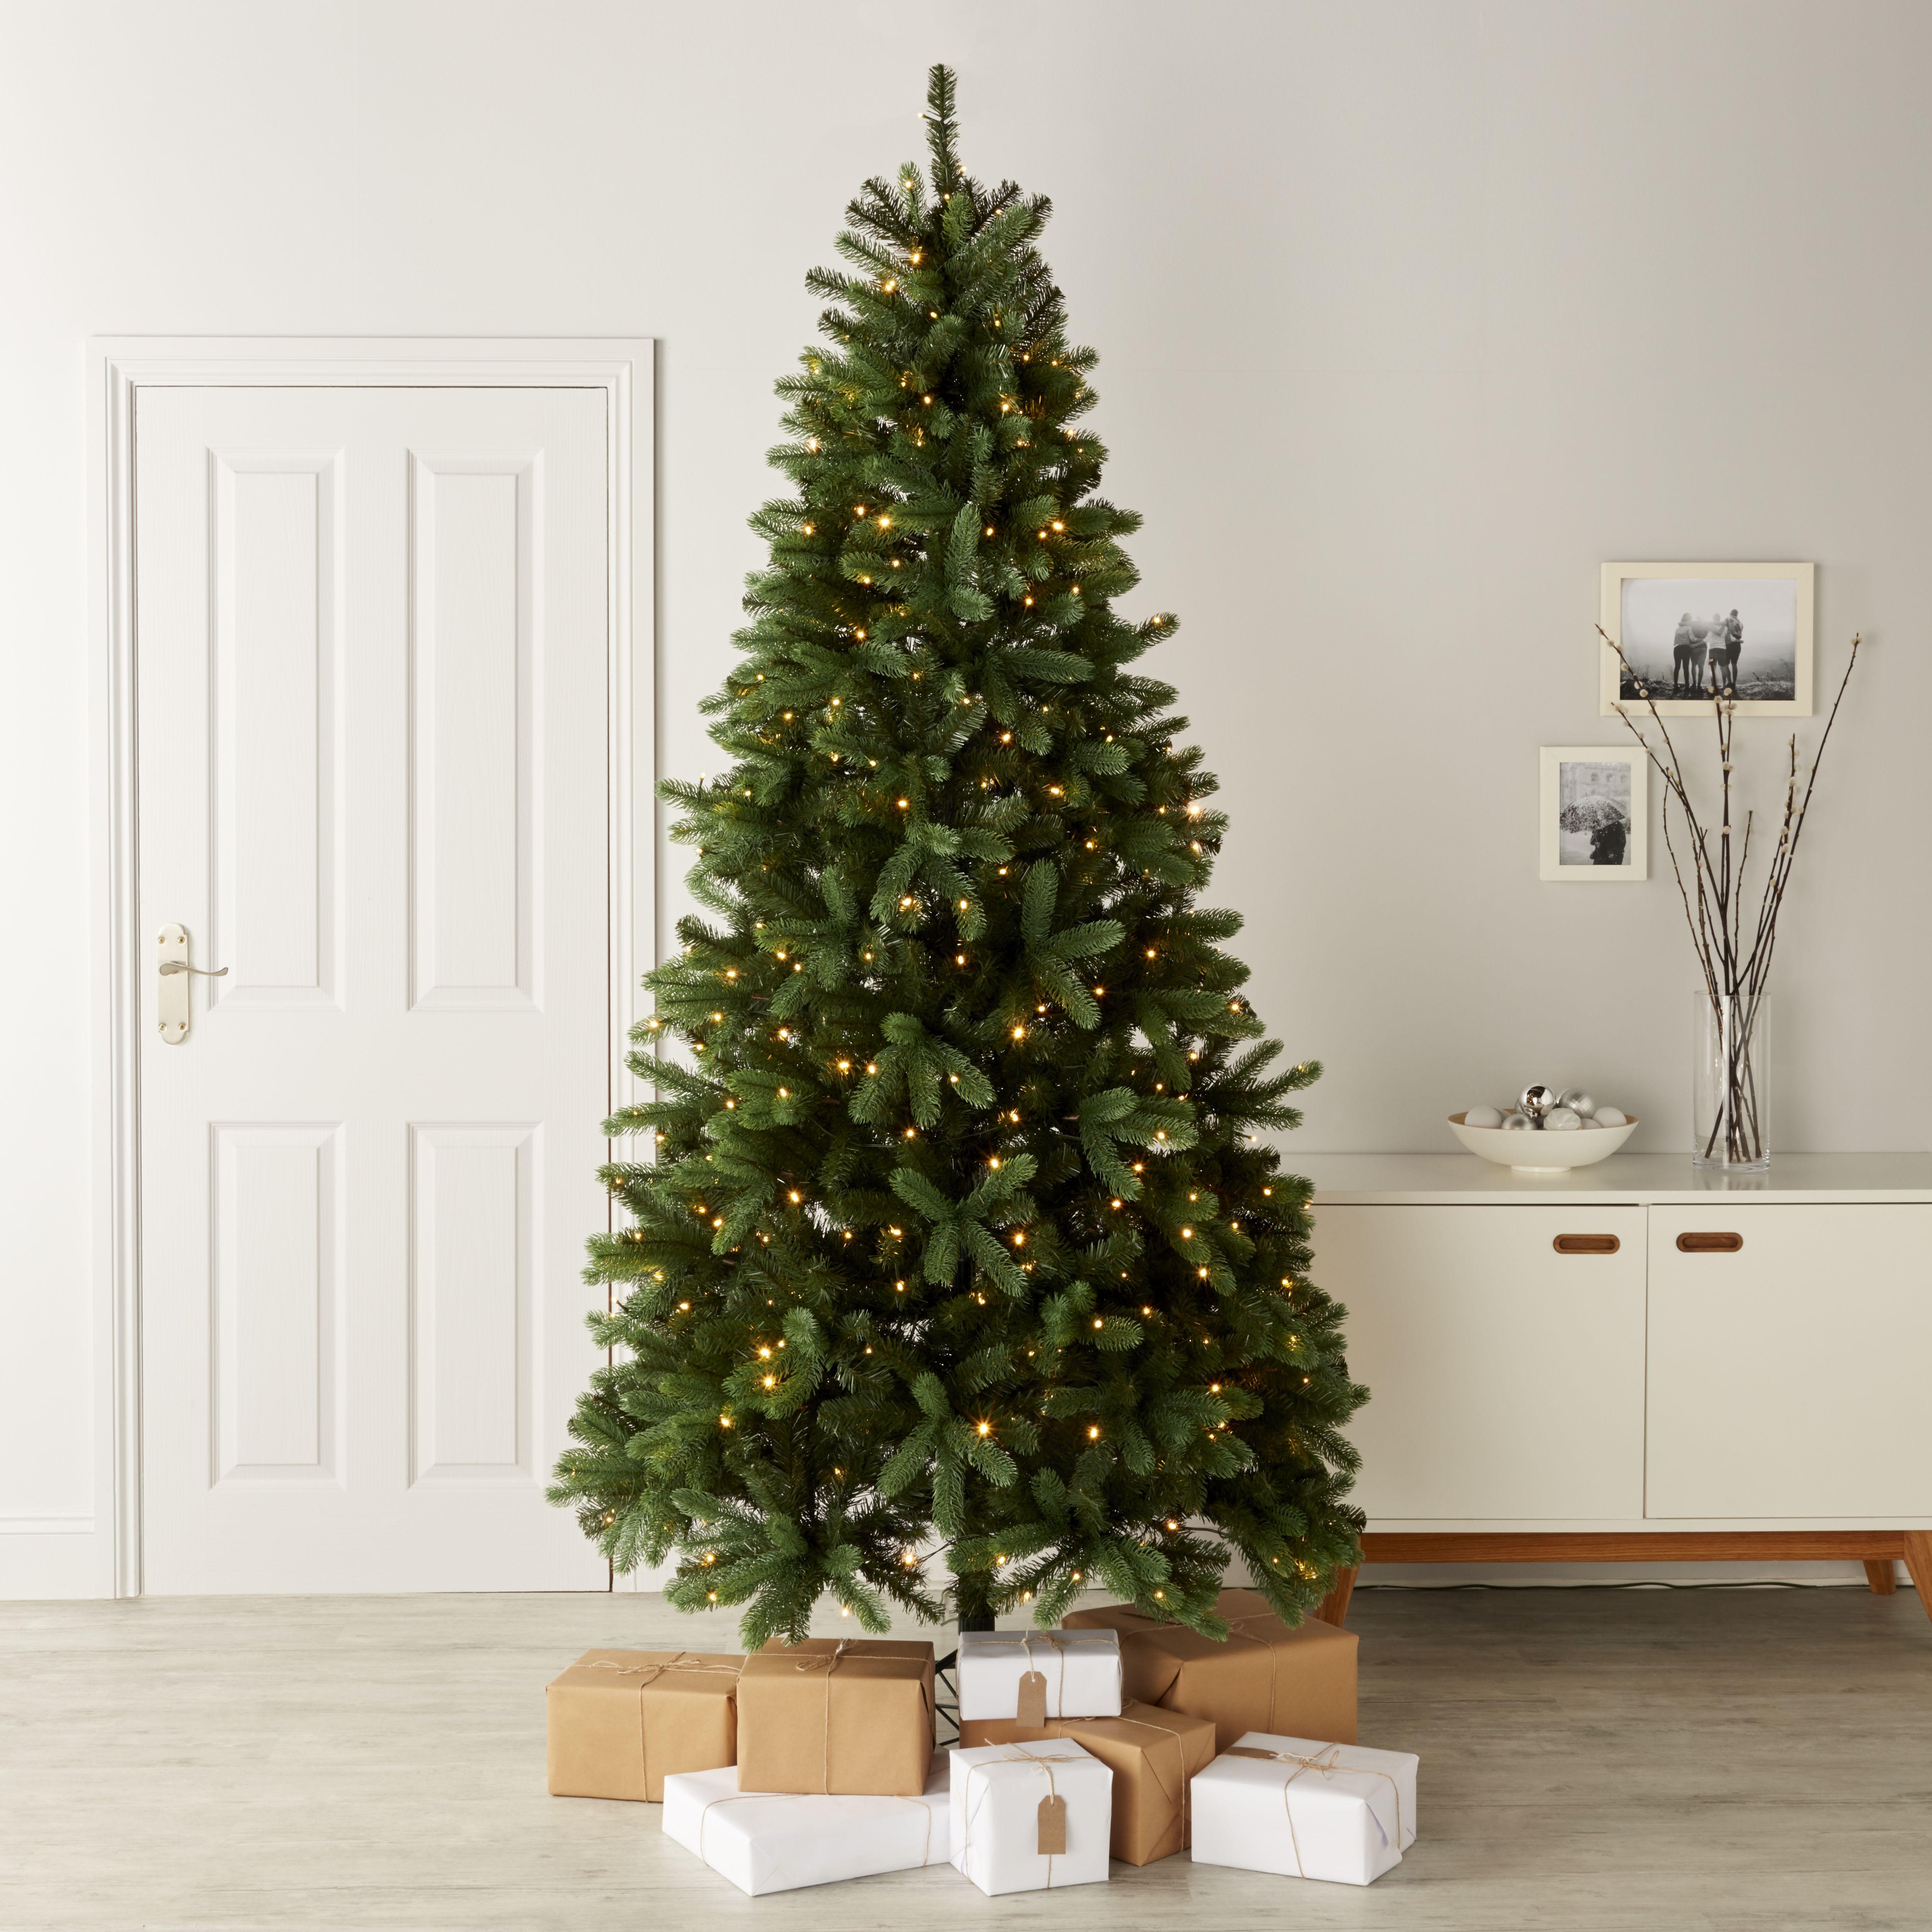 7 6ft Smart Natural Looking Artificial Christmas Tree Departments Diy At B Q